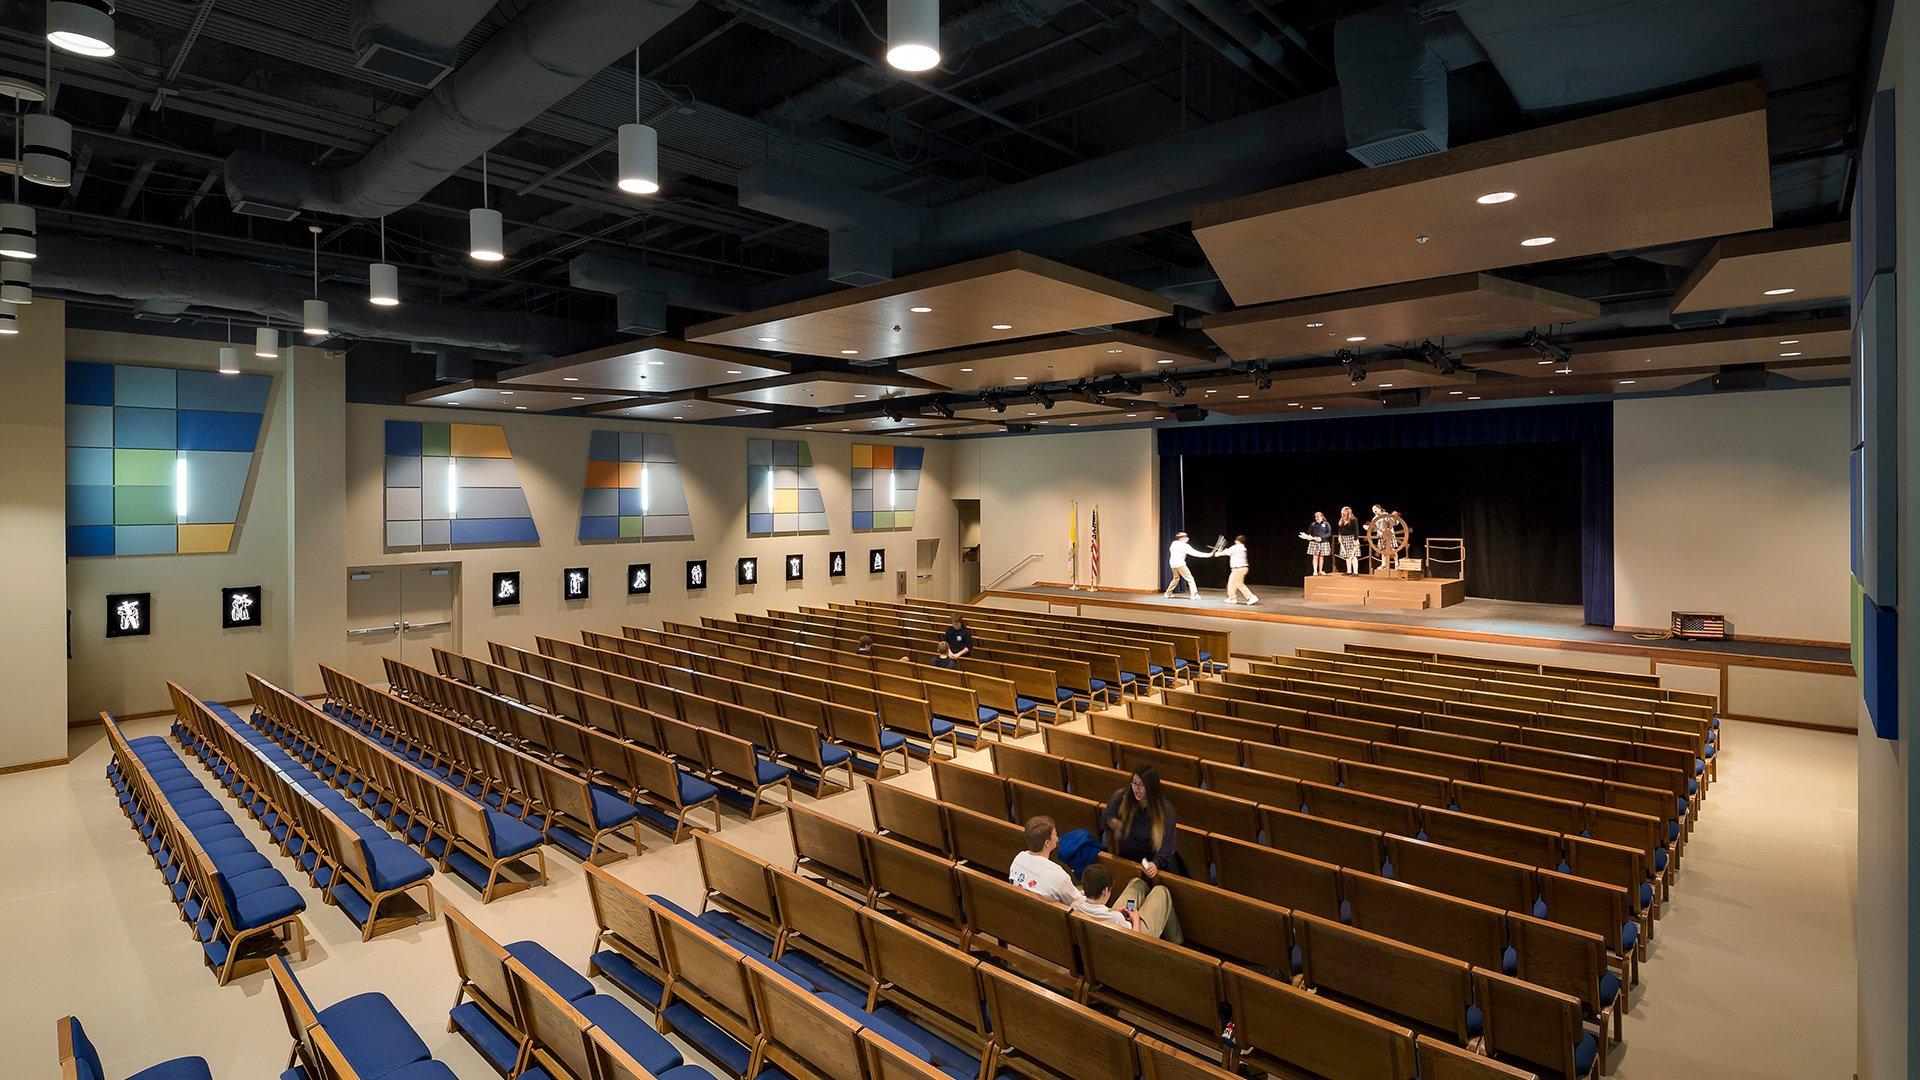 St. Joseph's Catholic School, The Saint John Paul II Center